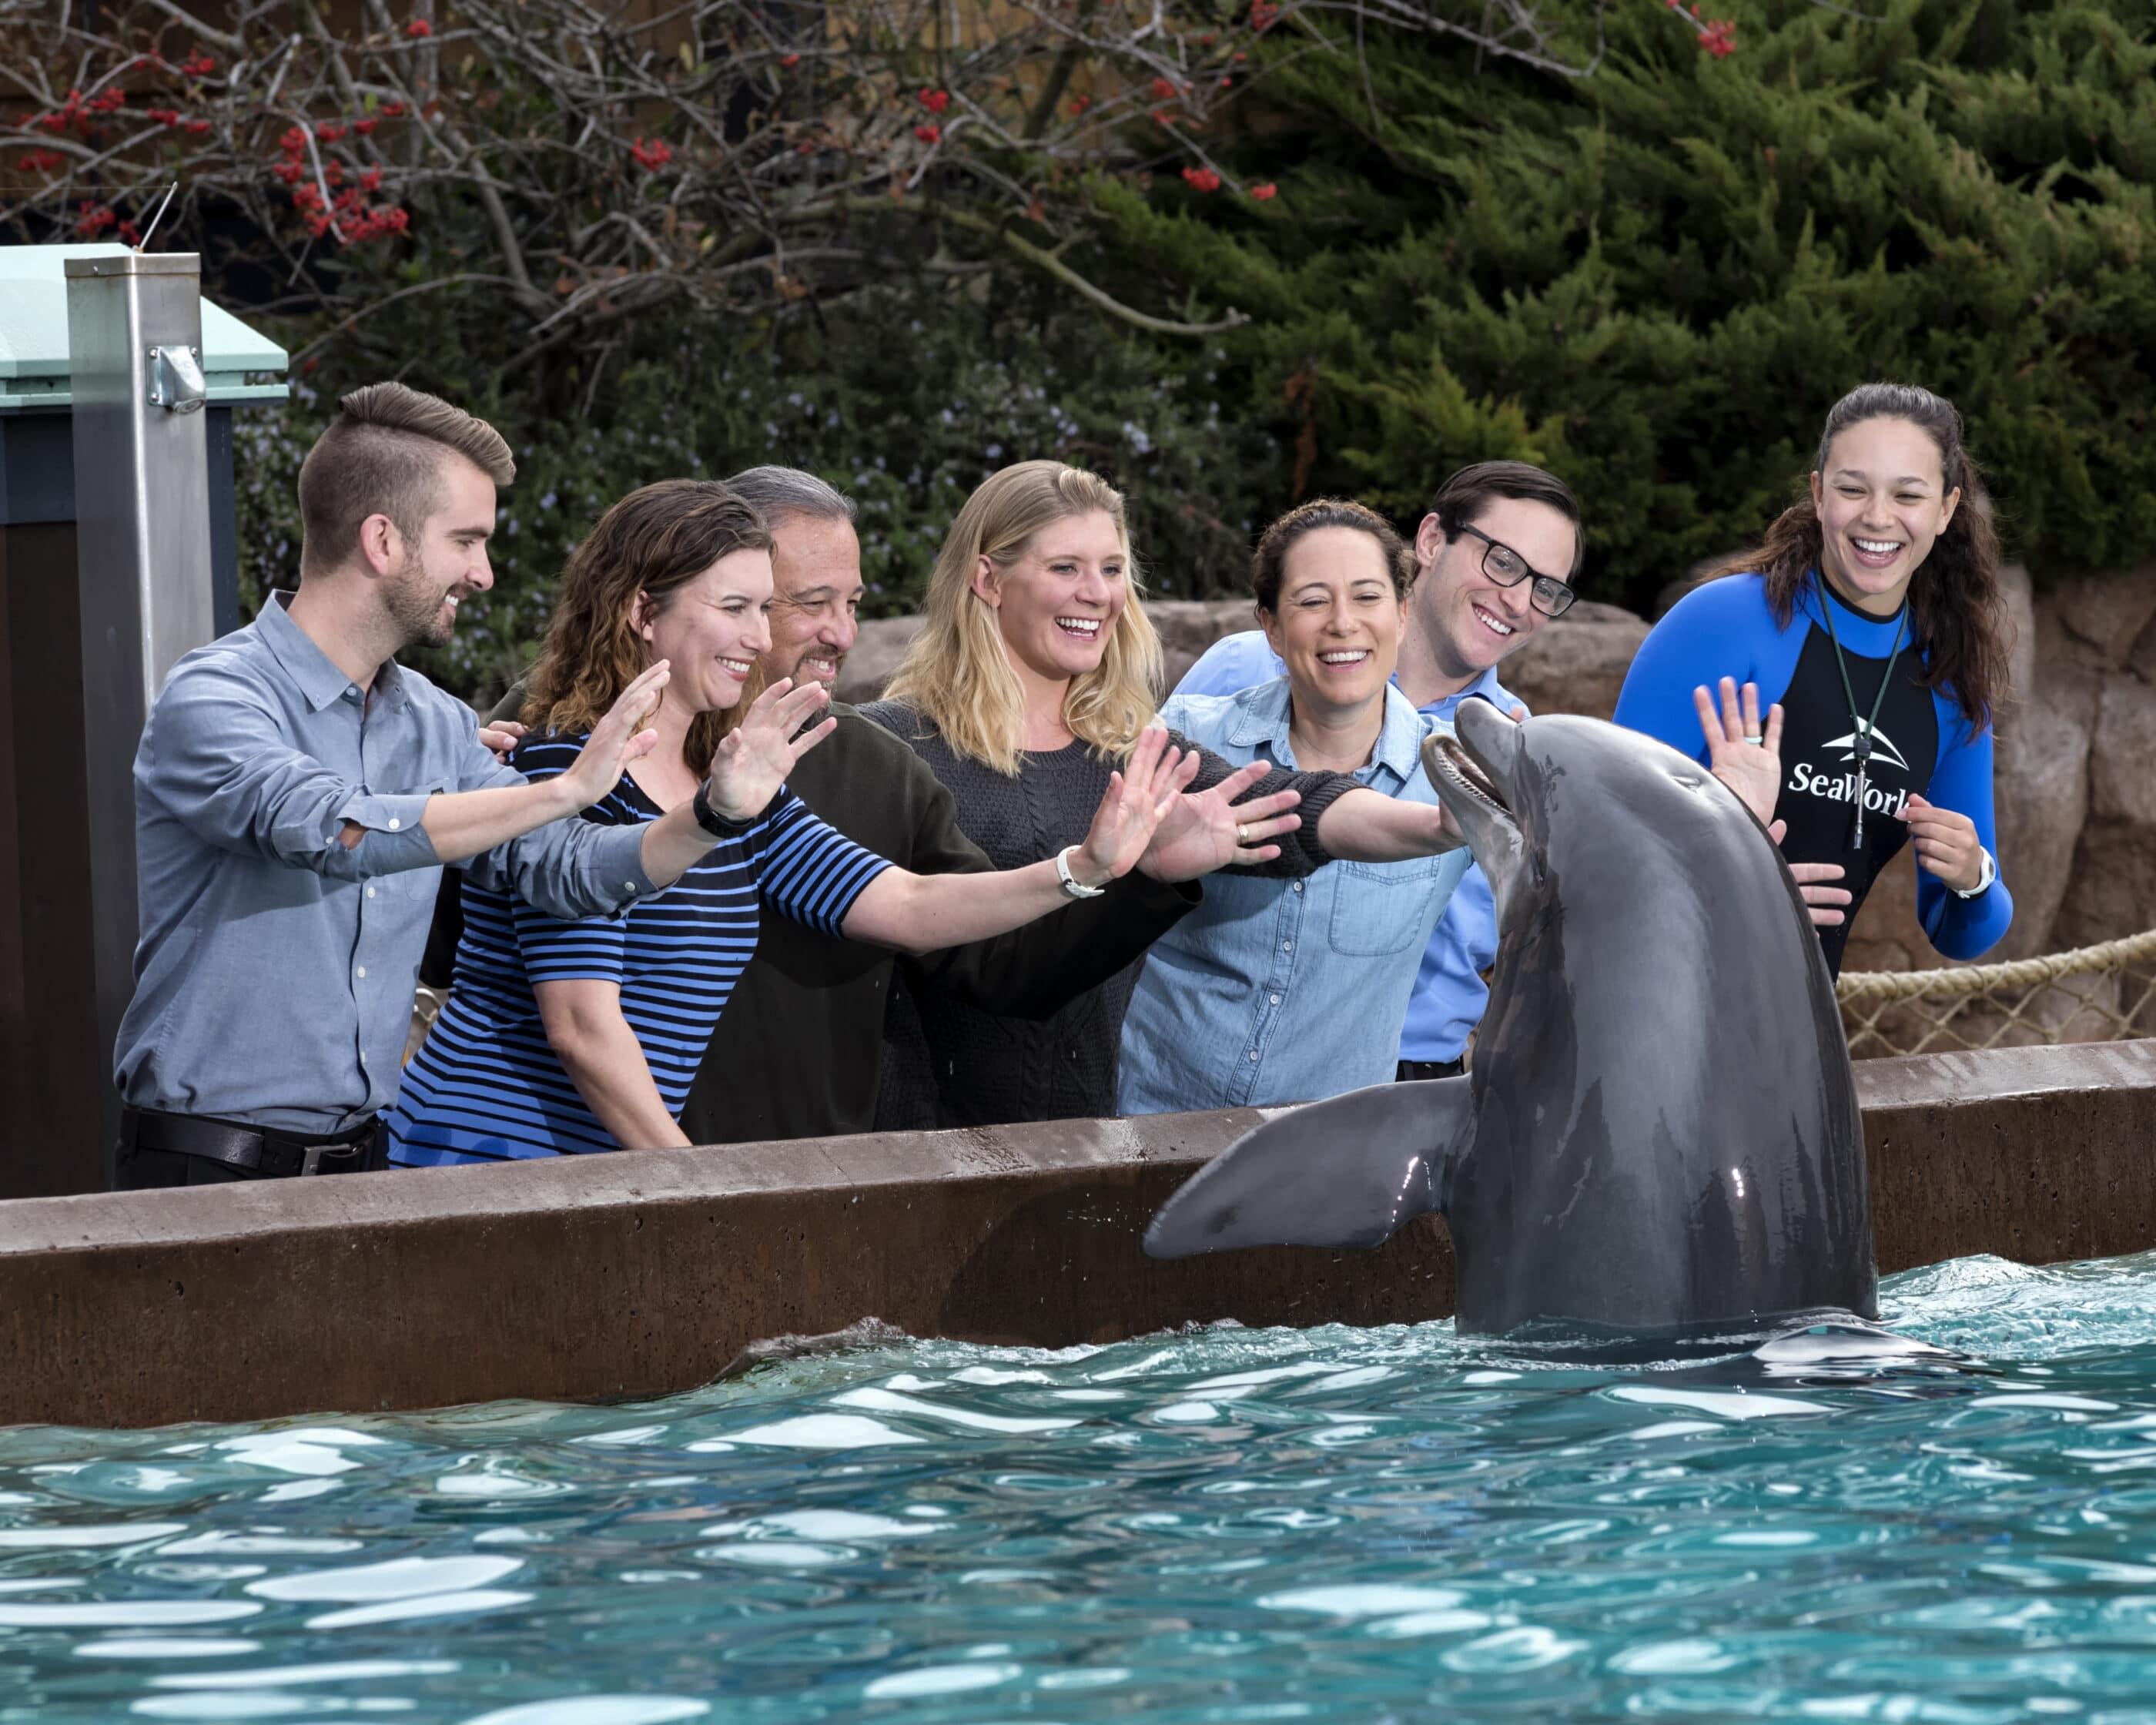 A dolphin greets waving guests at SeaWorld San Diego.